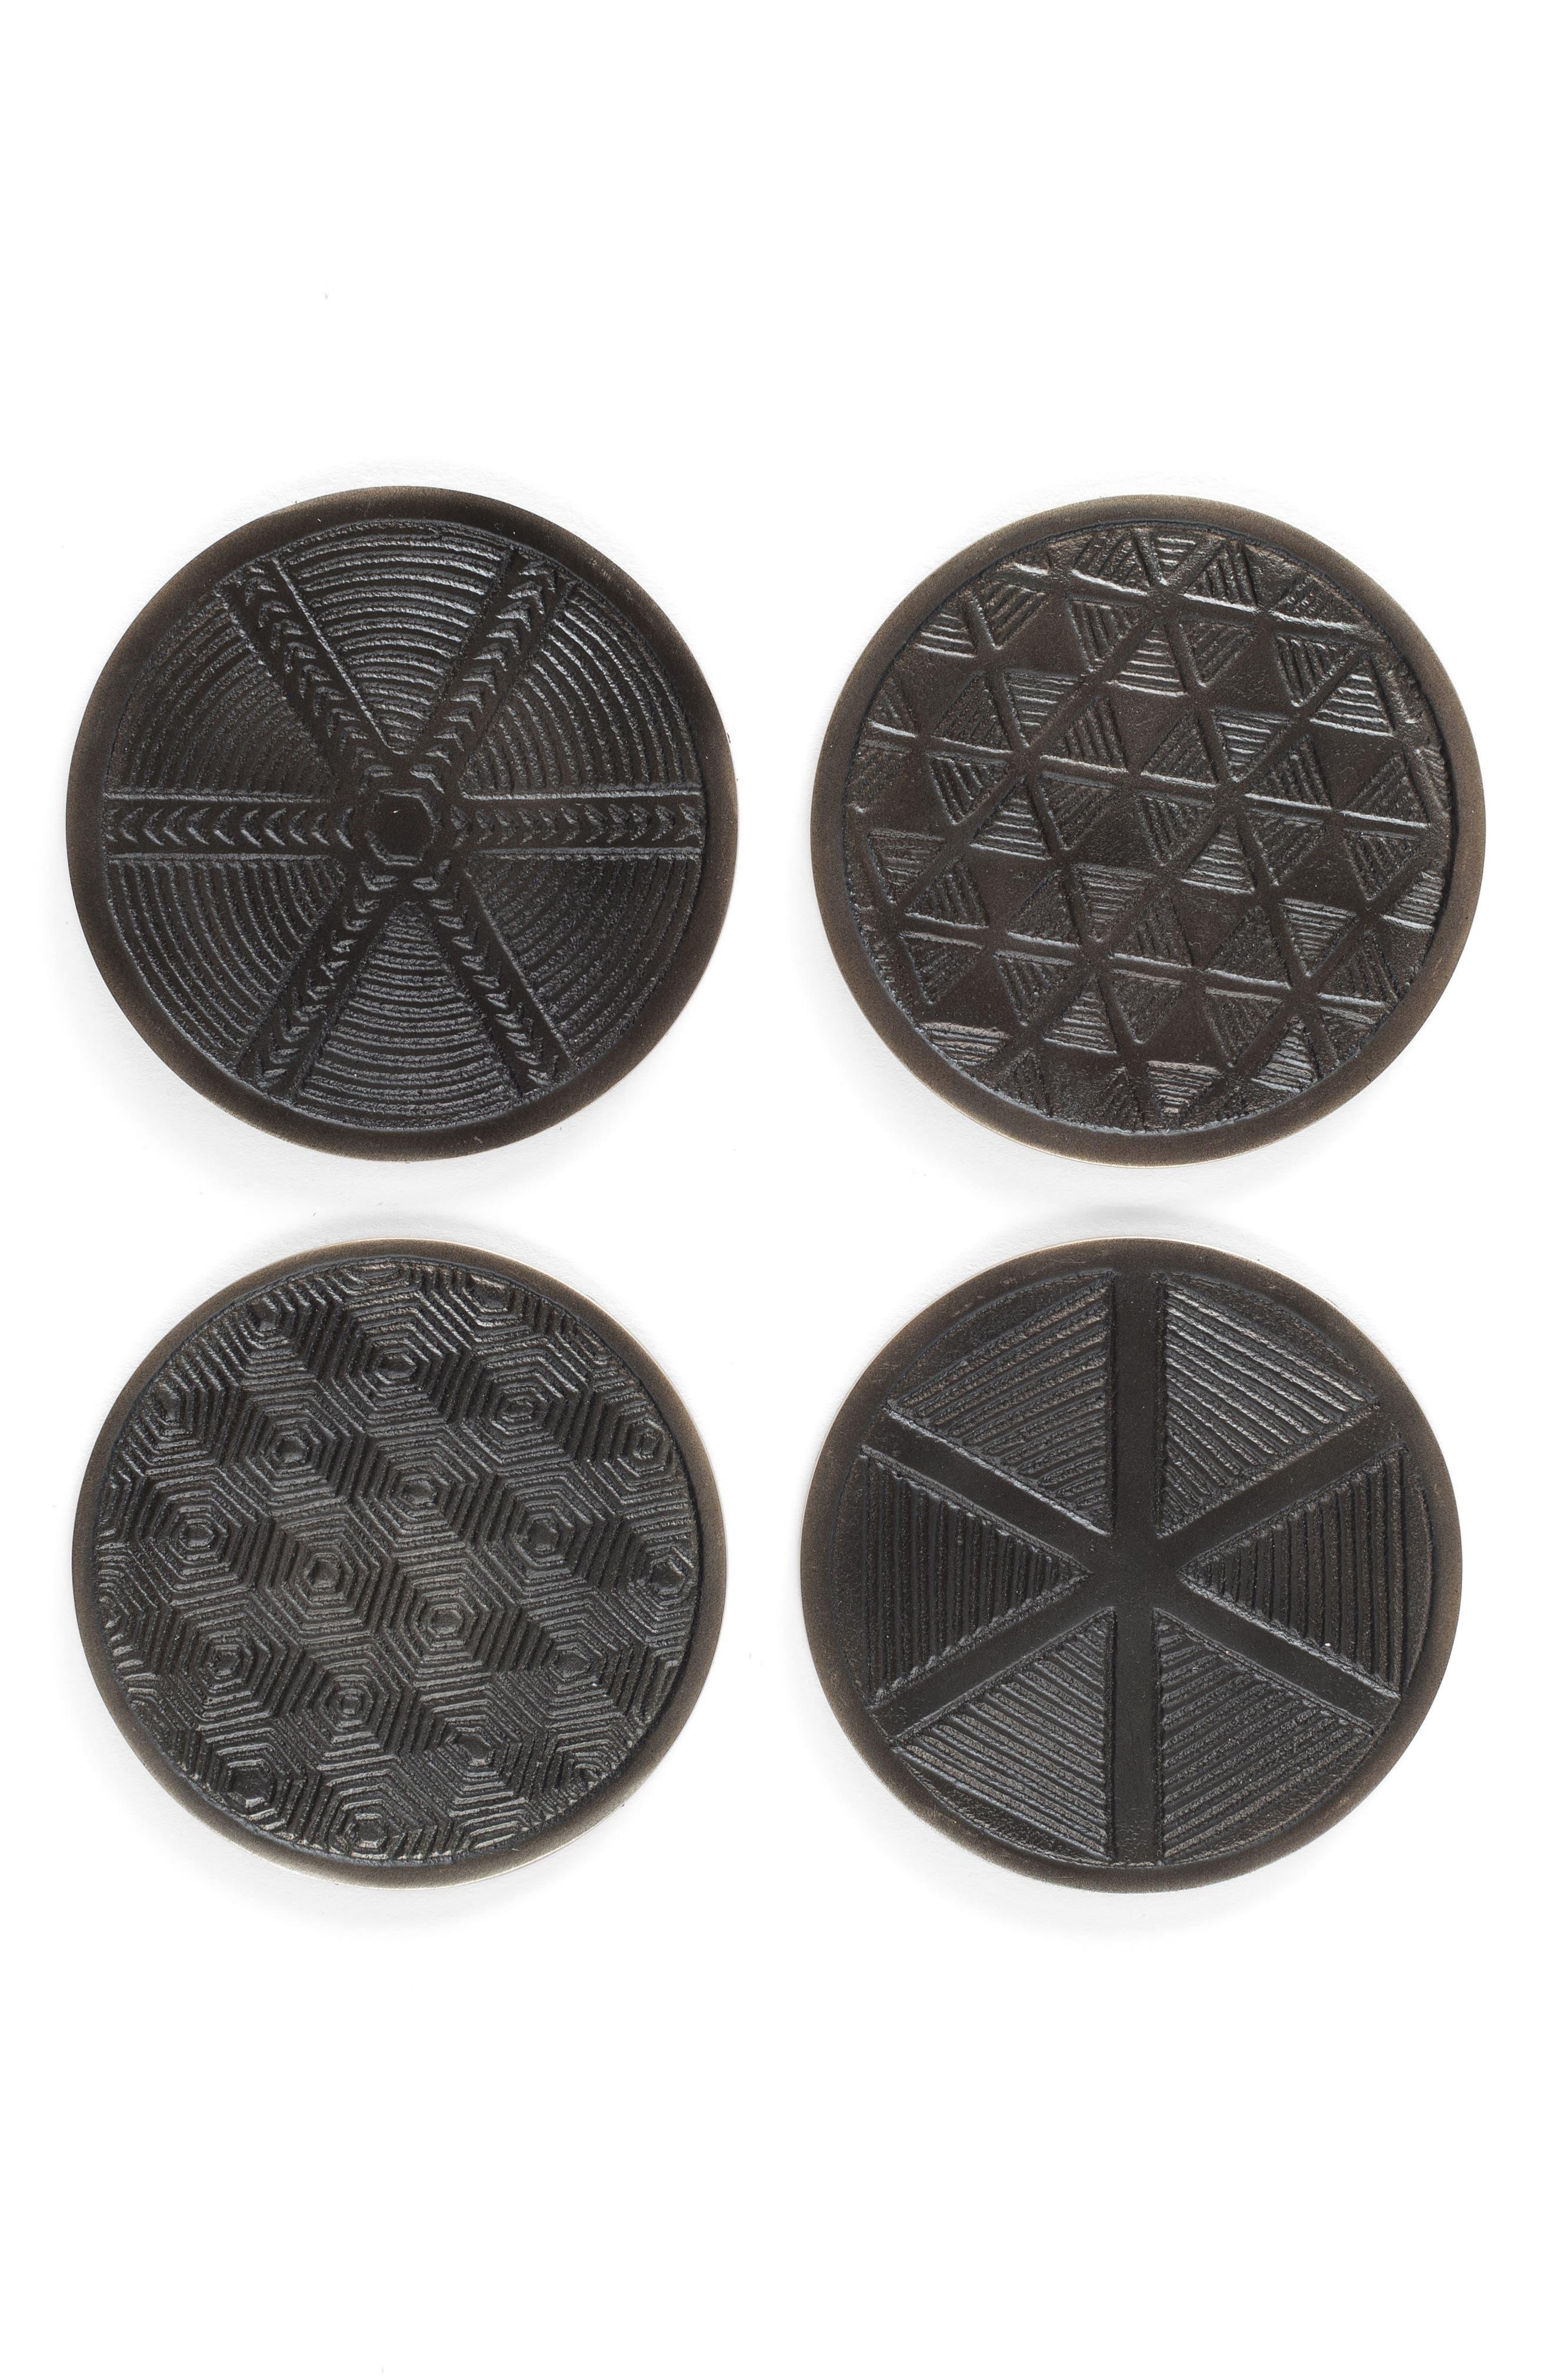 ZESTT Forged Set of 4 Coasters